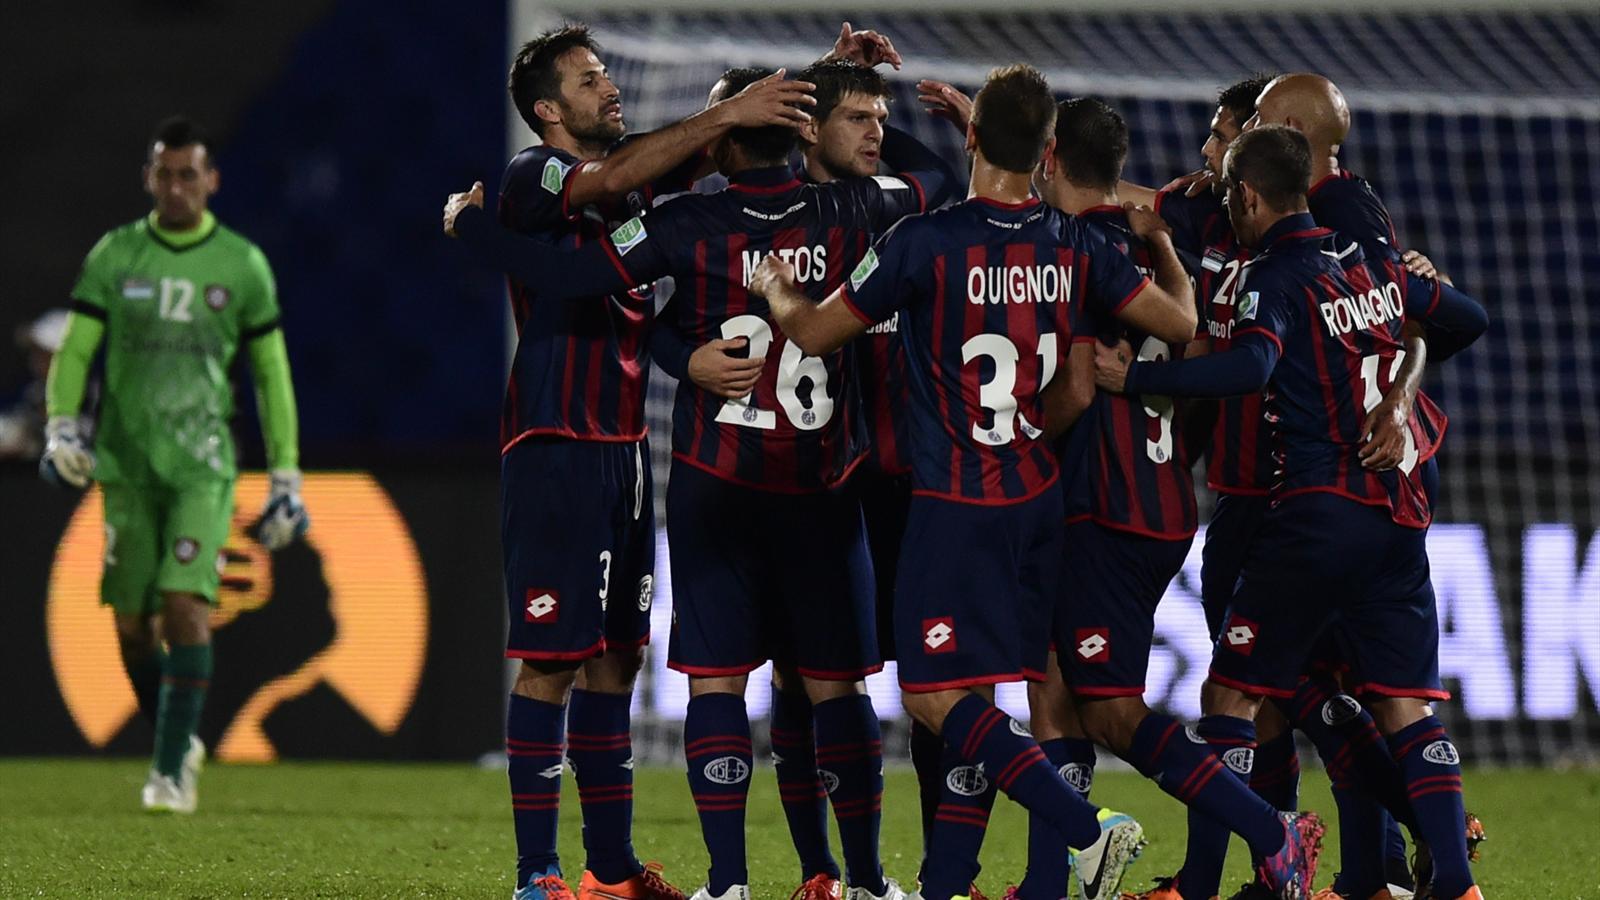 Mondial des clubs 2014 san lorenzo d fiera le real - Resultat foot feminin coupe de france ...